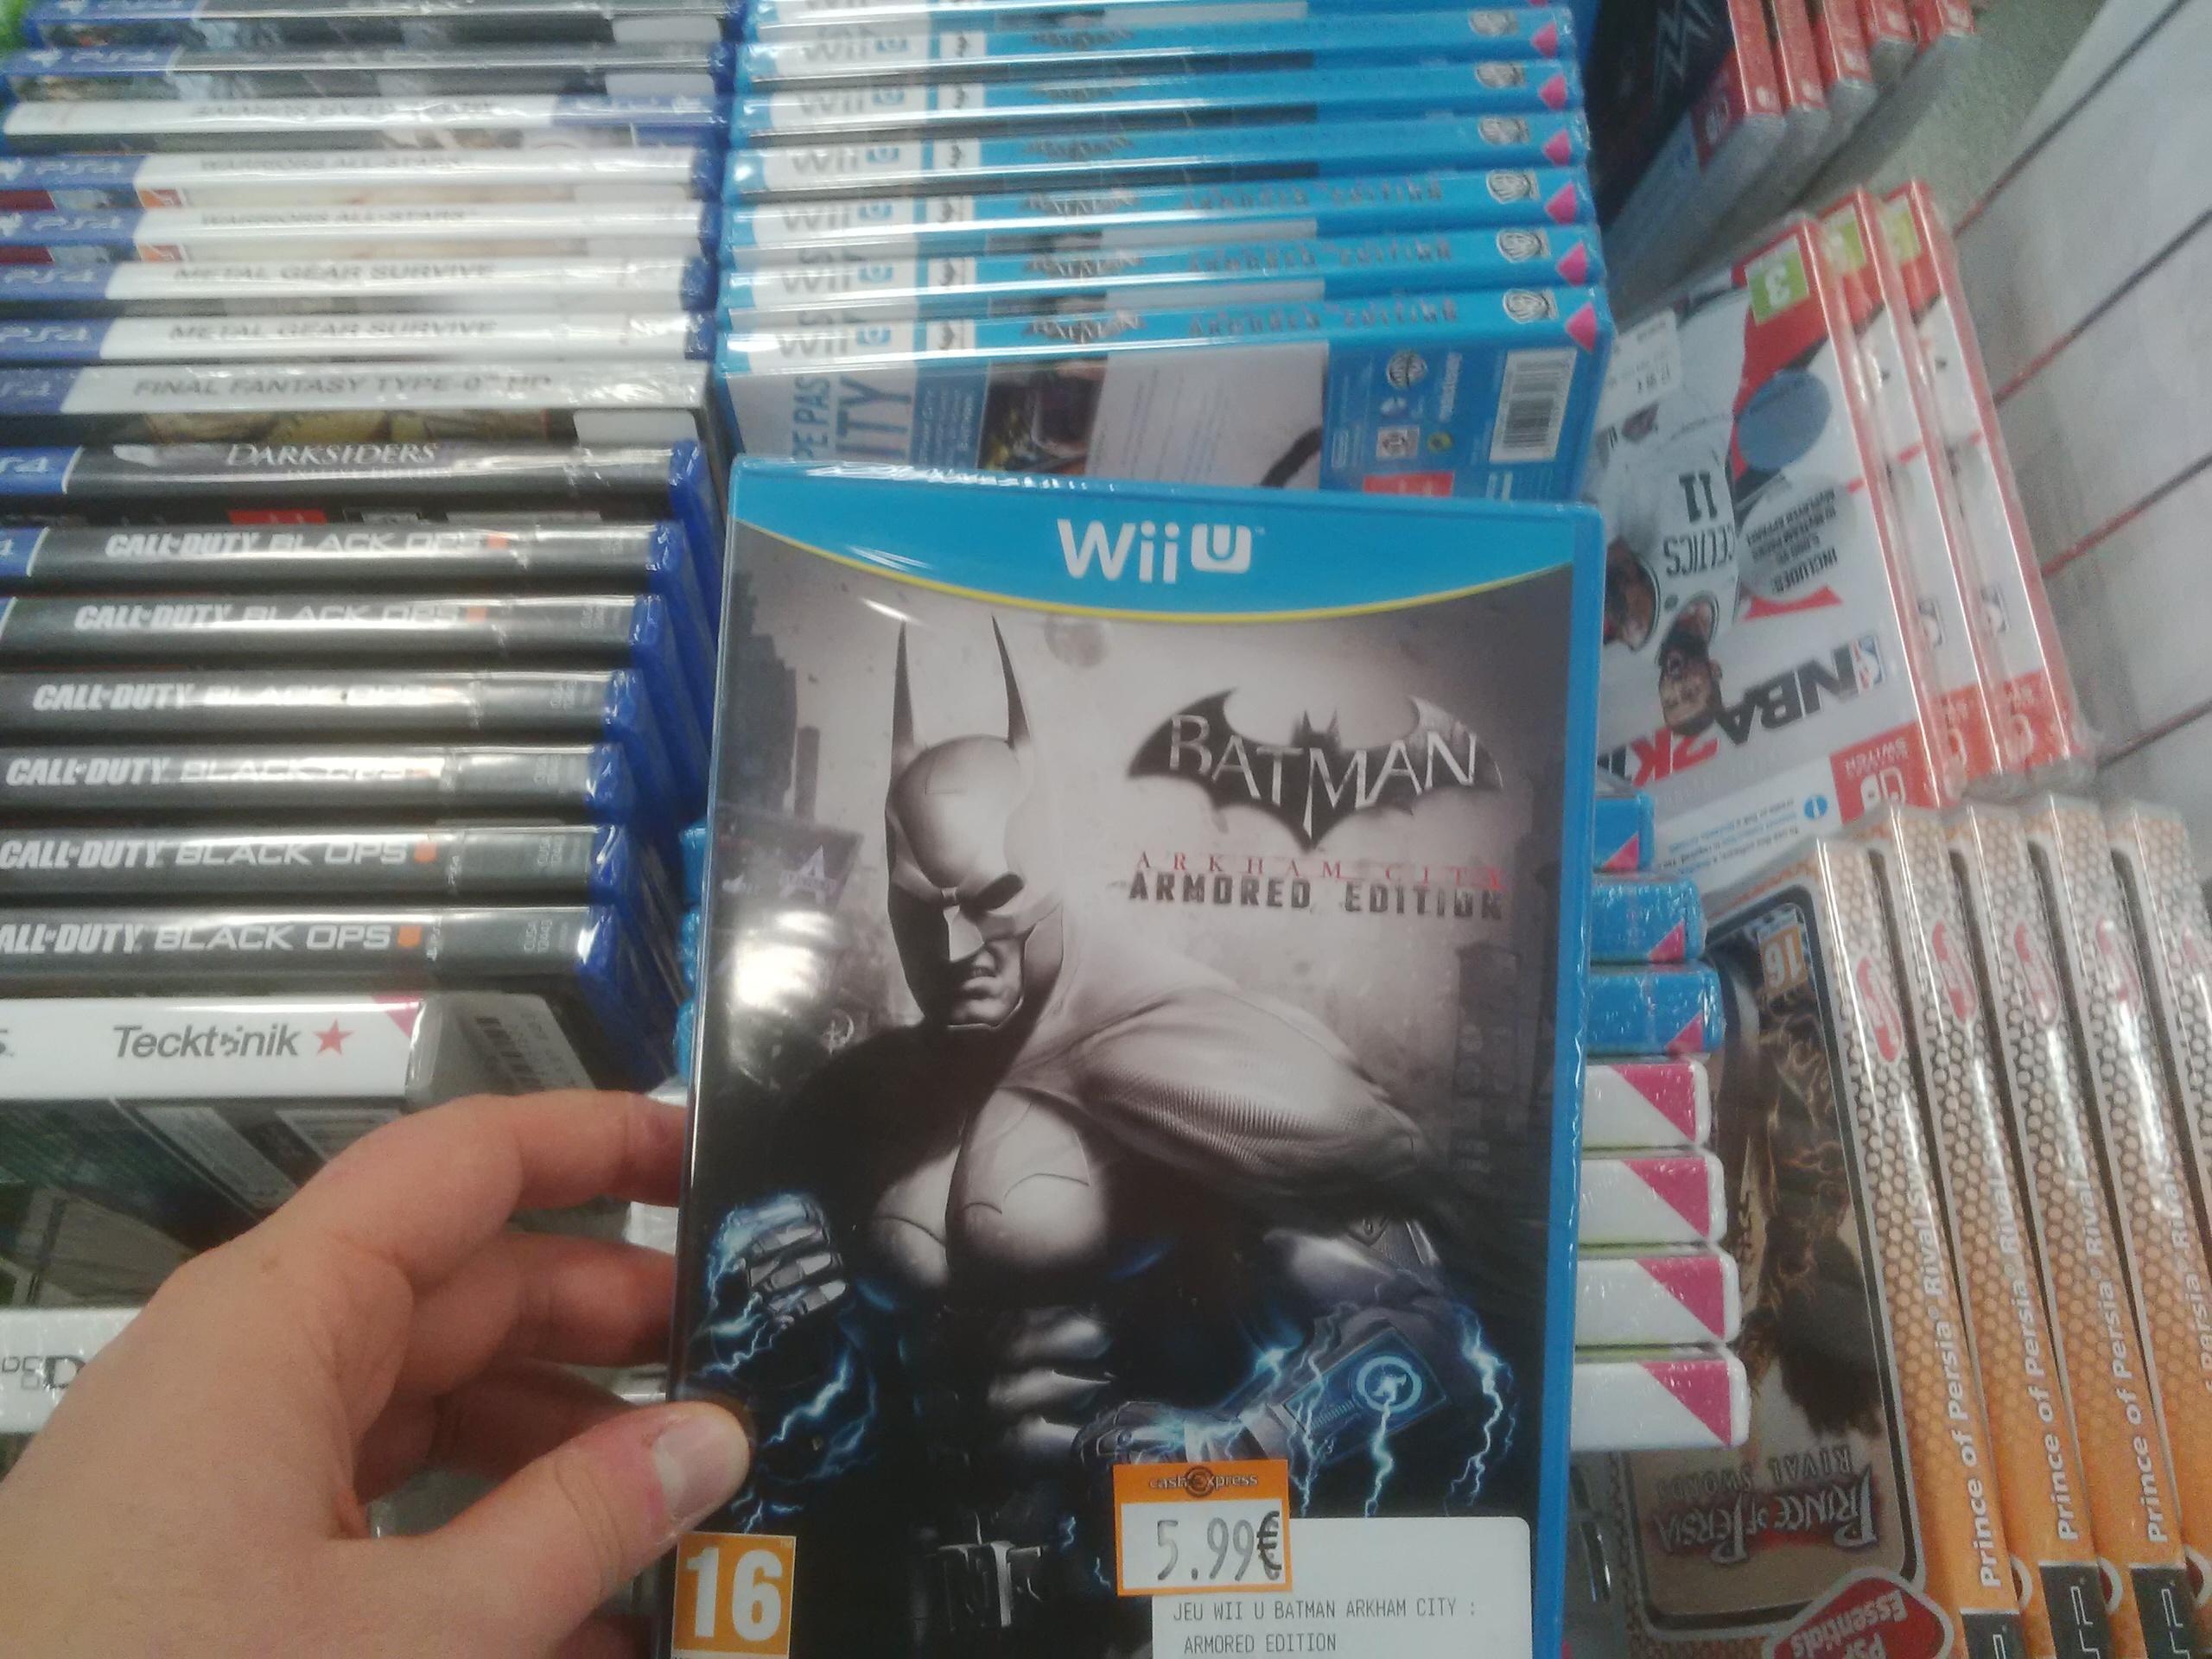 Batman Arkham City Armored Edition sur Wii U - Cash Express Montbéliard (25)